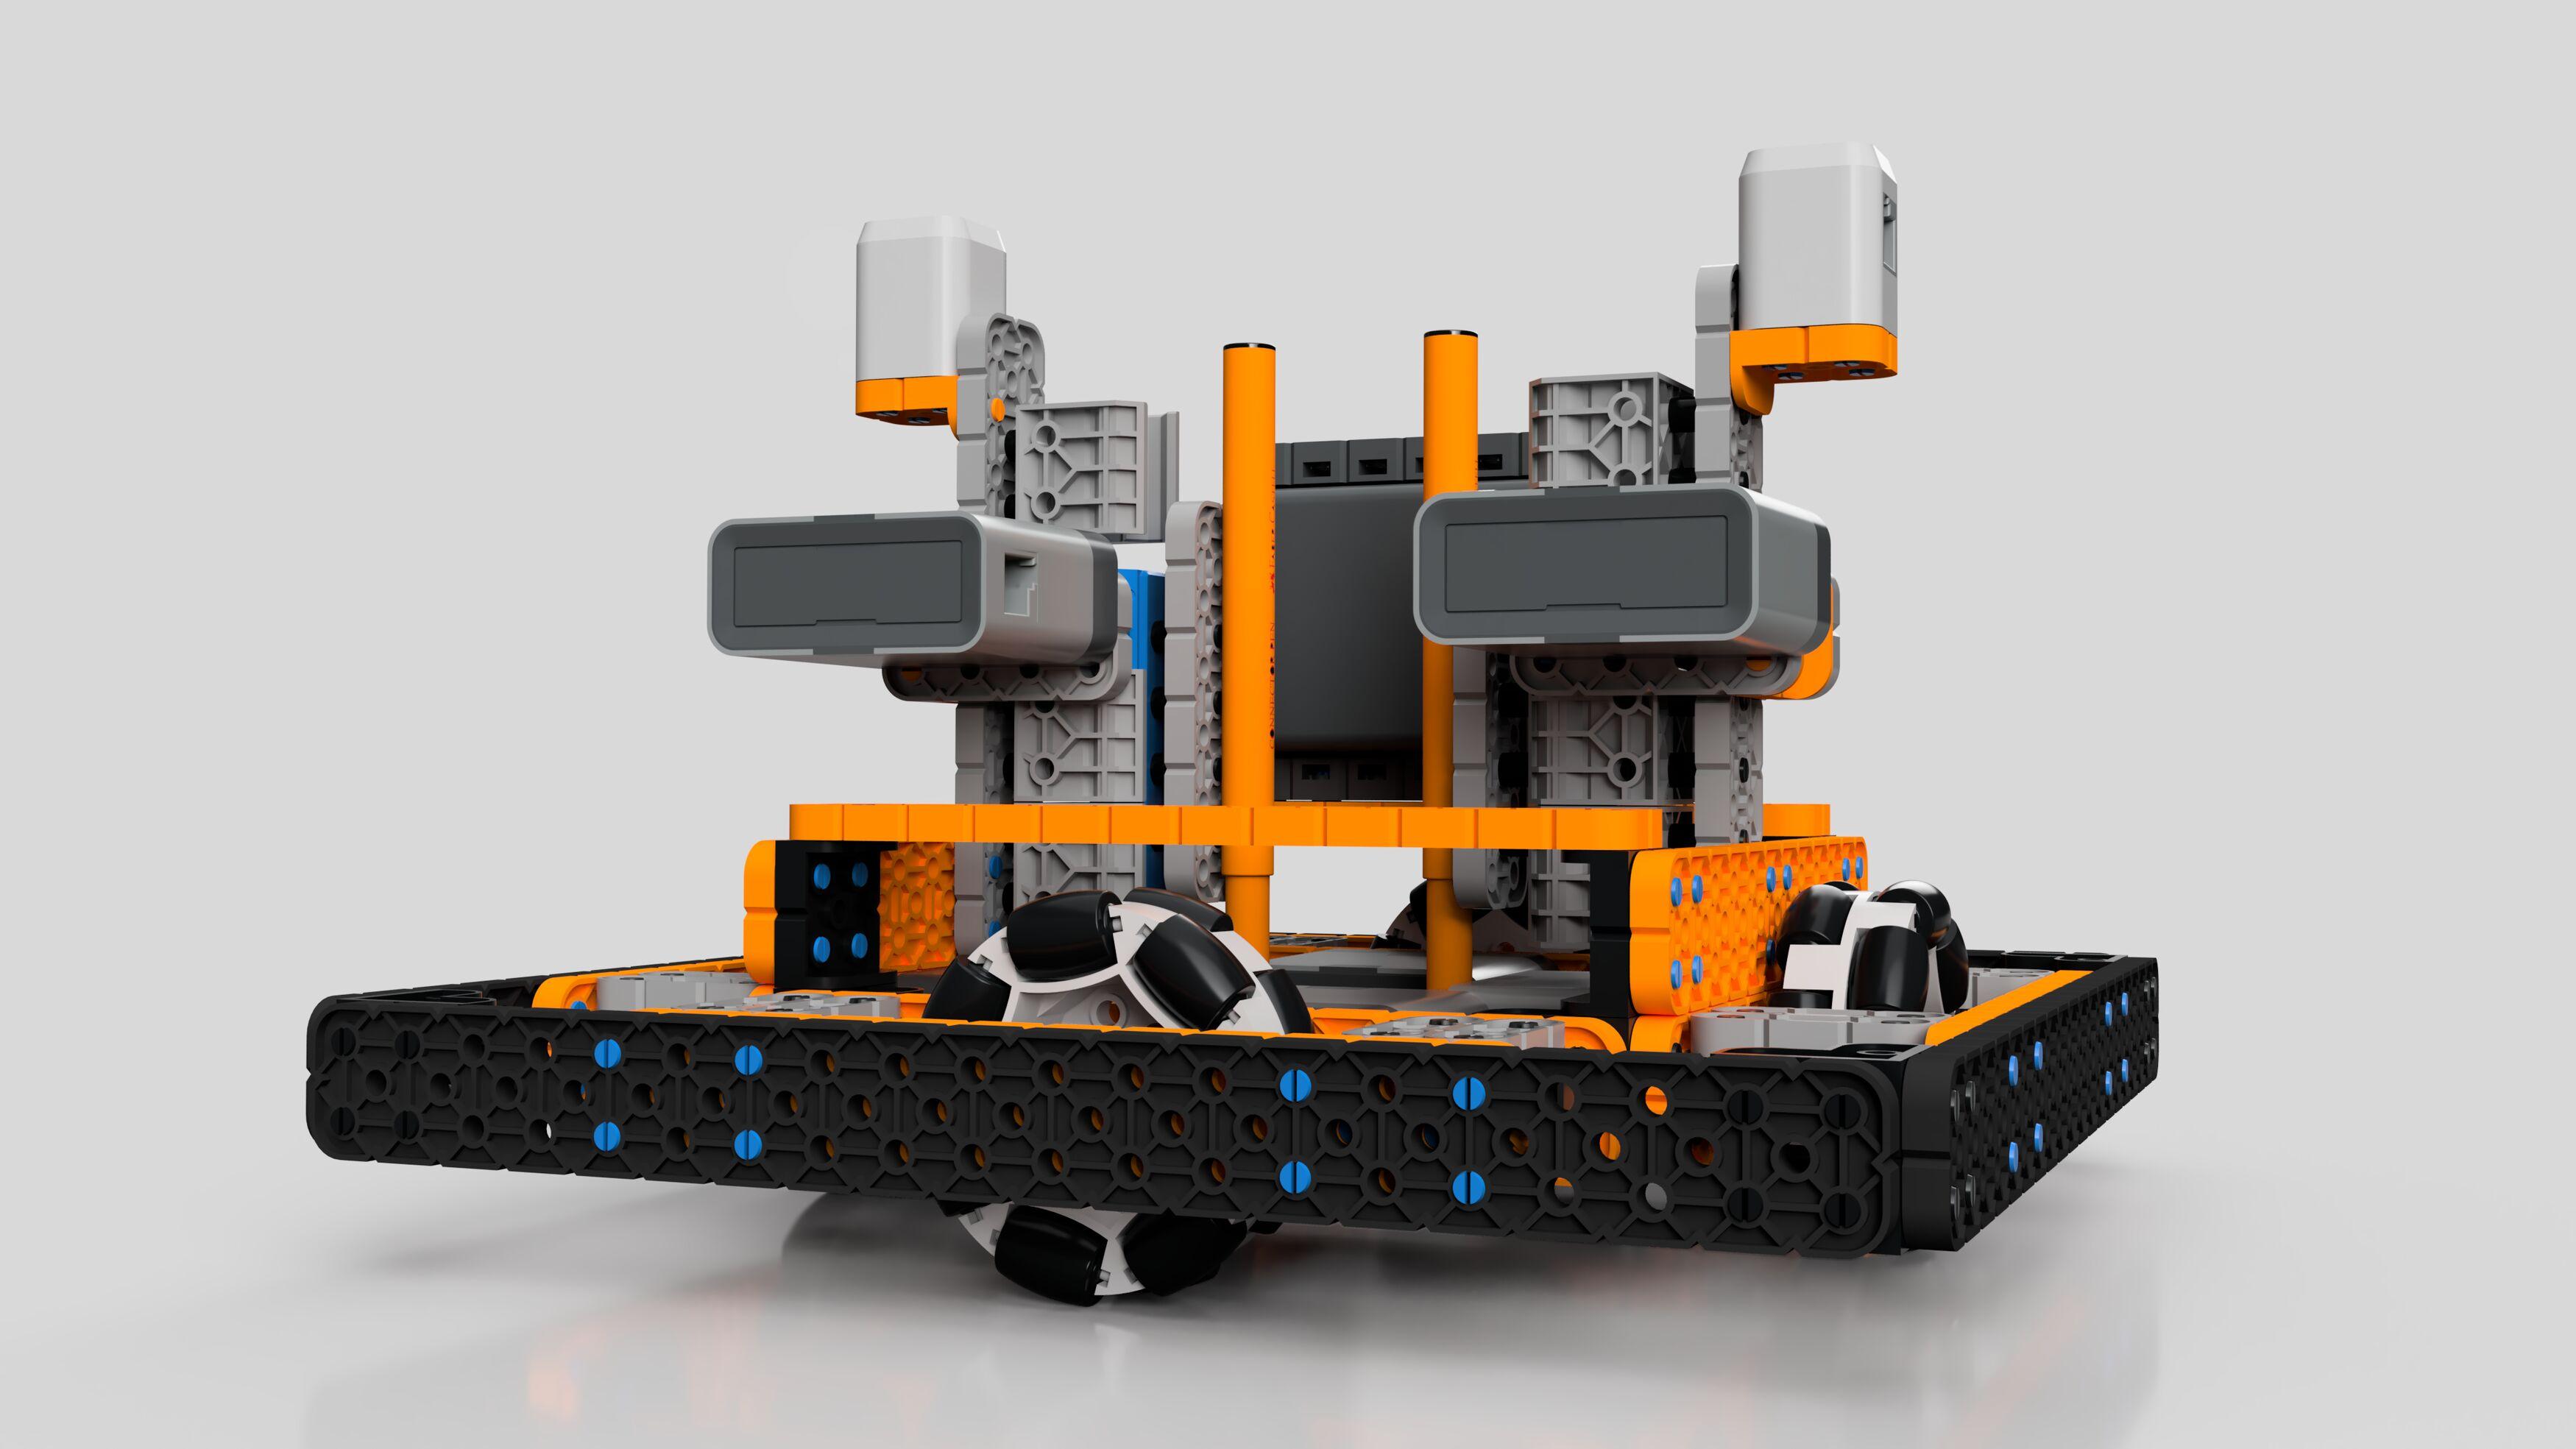 Robotics-pen-oficial-2-cores---fabrica-de-nerdes-2020-may-28-08-06-05pm-000-customizedview758688688-png-3500-3500